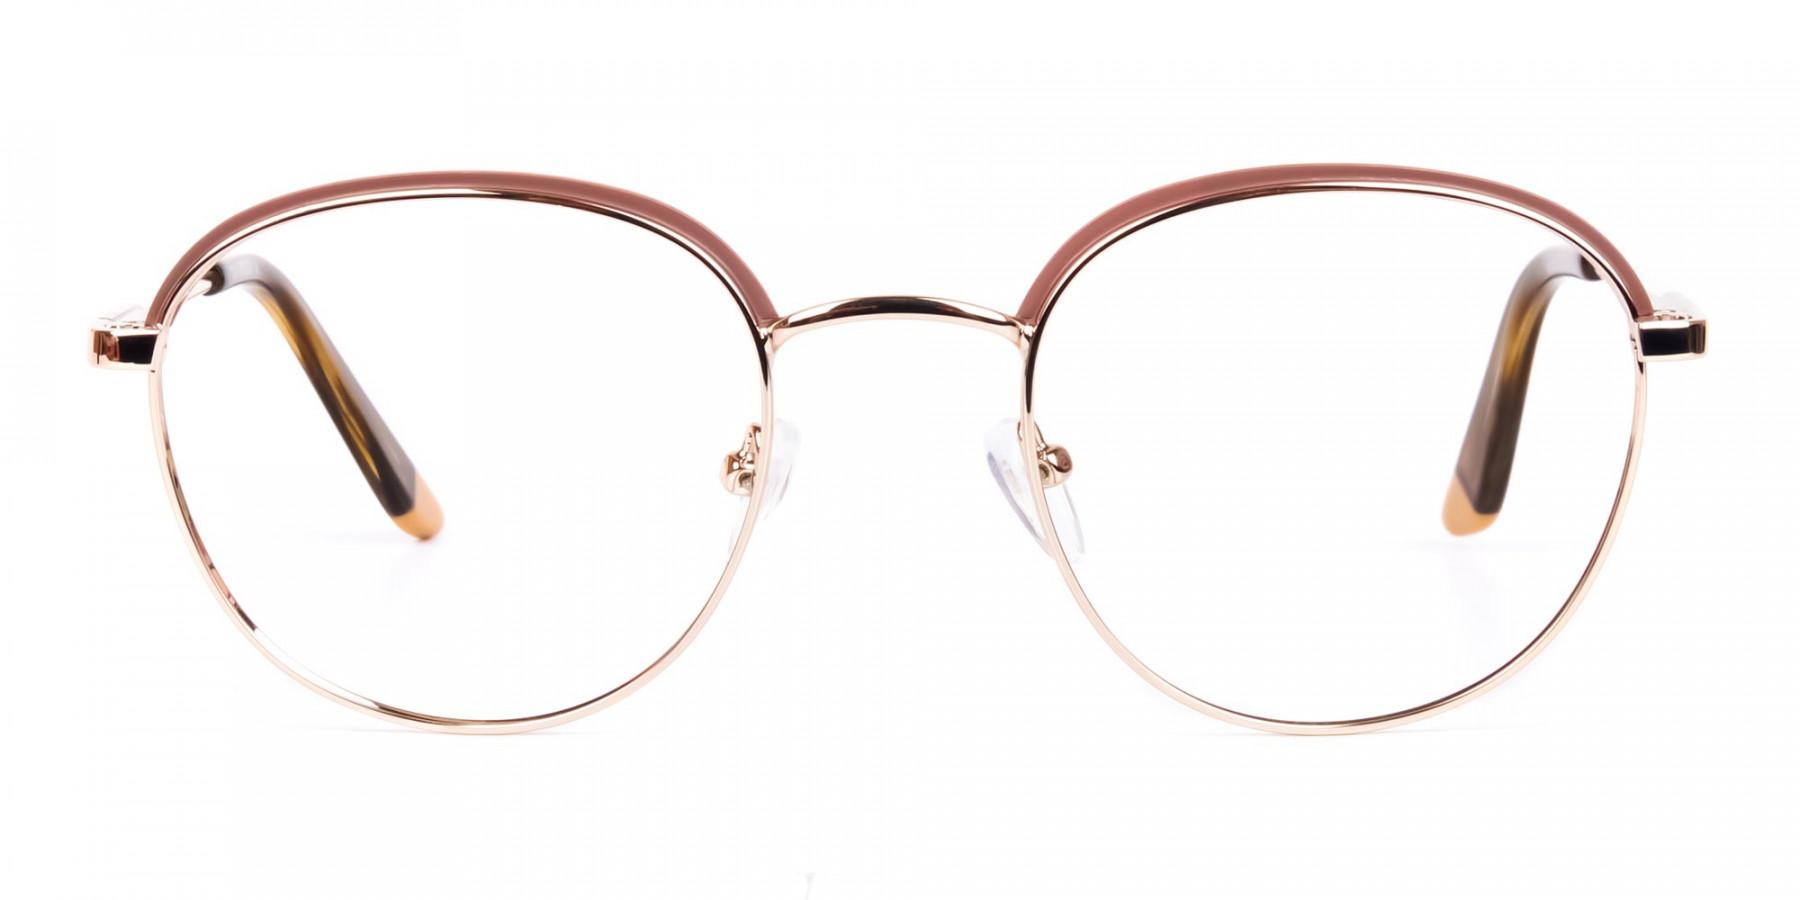 Brown-Gold-Round-Aviator-Glasses-1